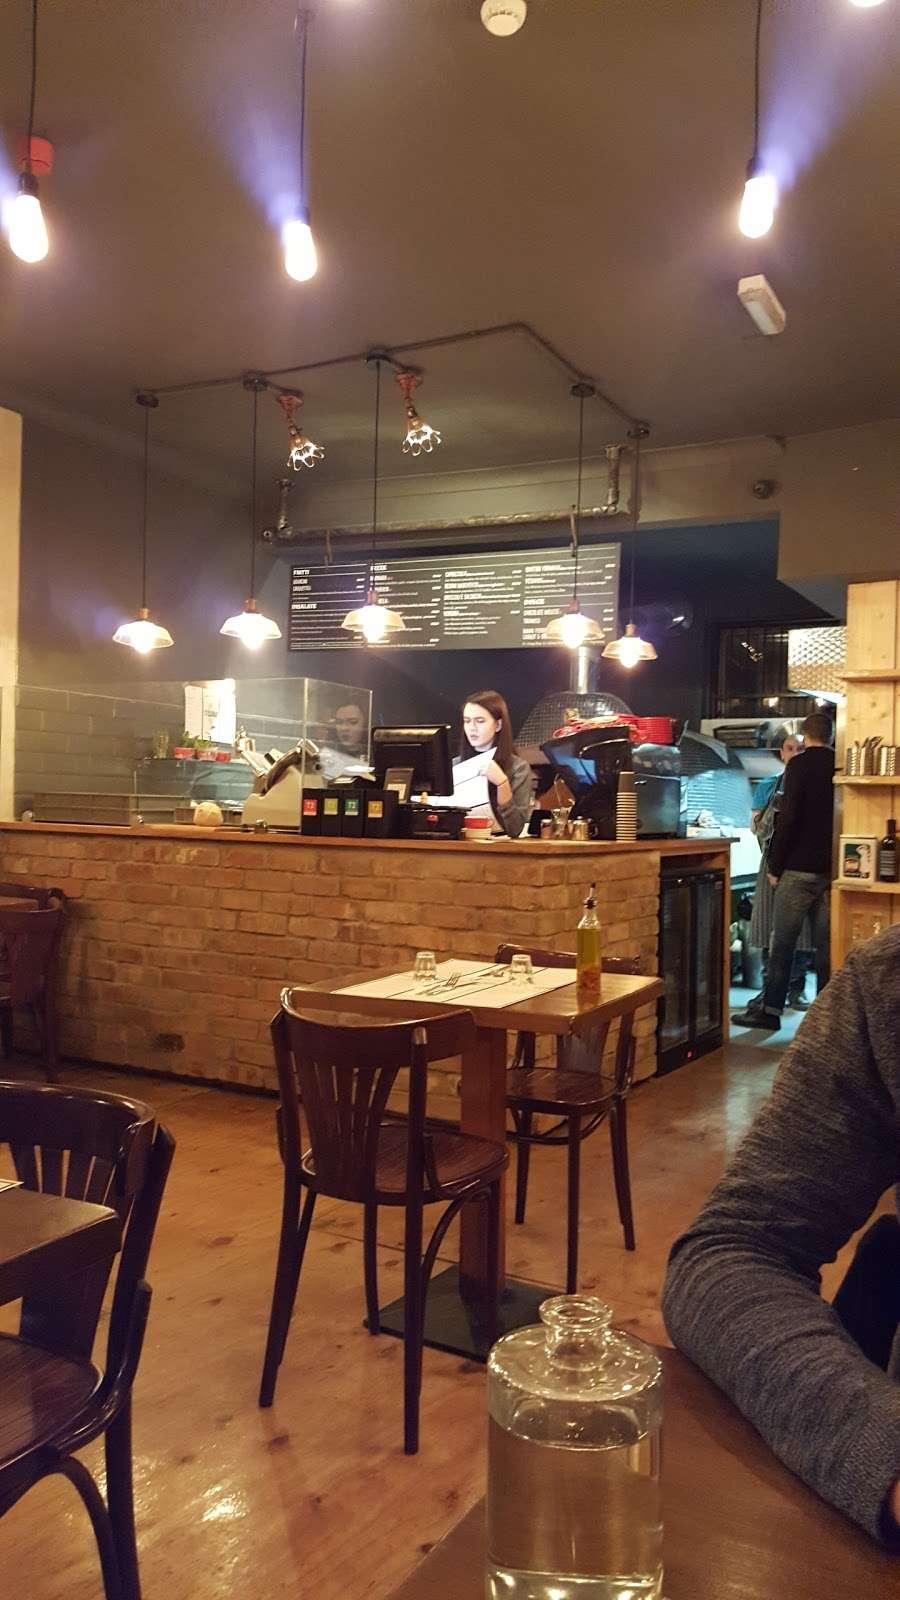 Pizzeria Di Camden - restaurant    Photo 2 of 10   Address: 195 Royal College St, London NW1 0SG, UK   Phone: 020 7284 3388